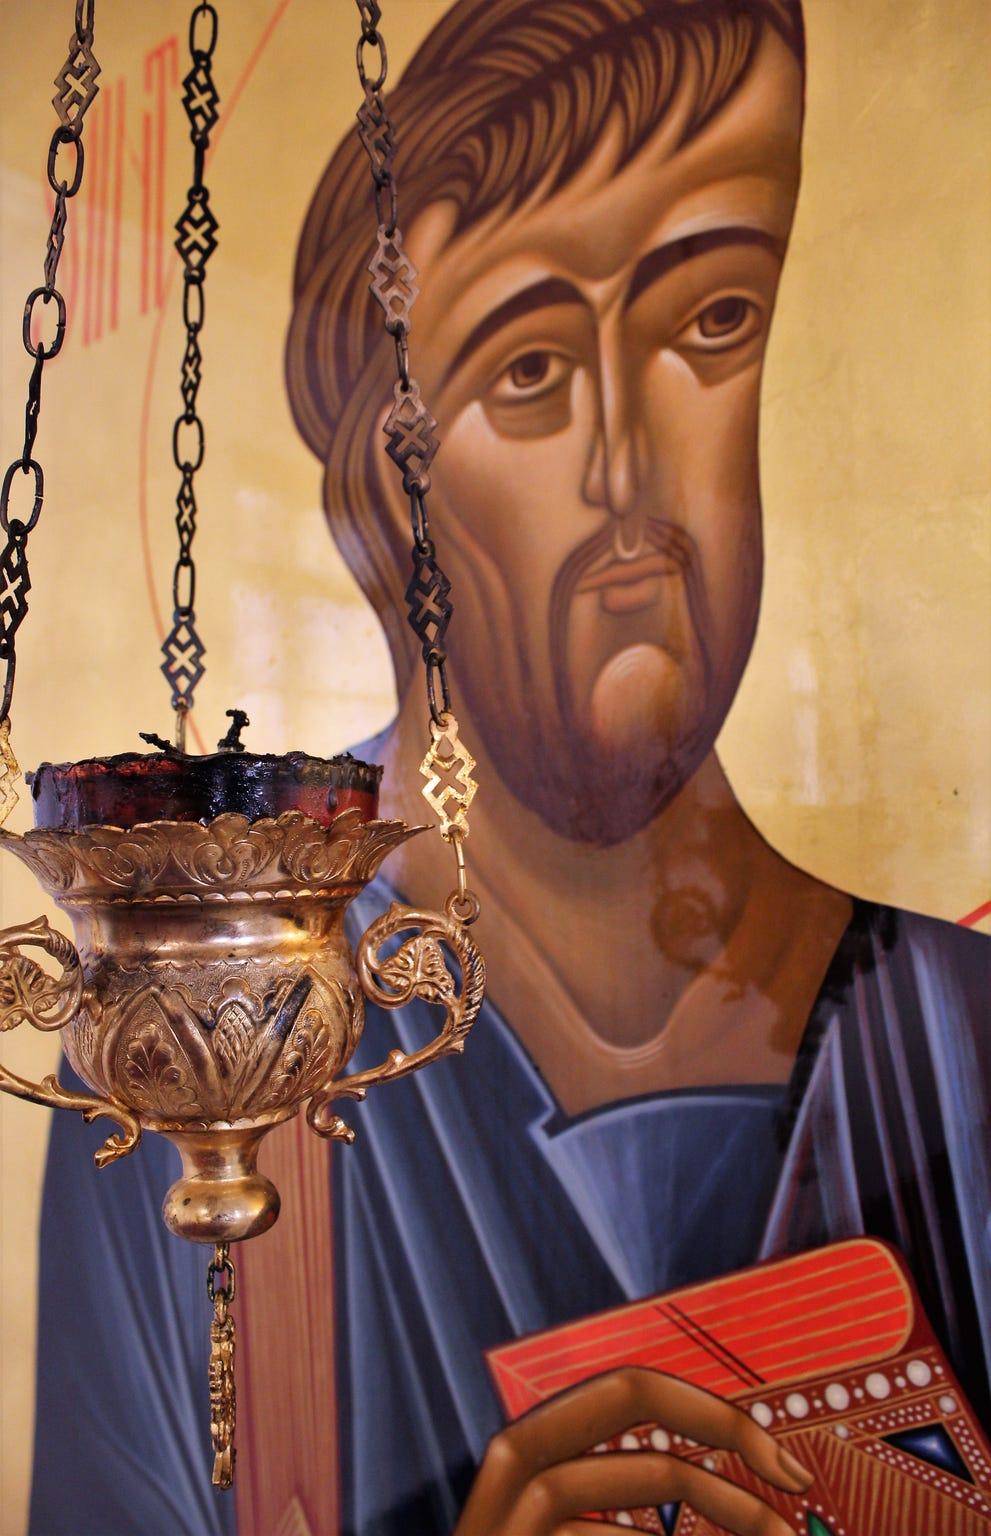 An icon of St. Luke is perfect for St. Luke Orthodox Church in Abilene.